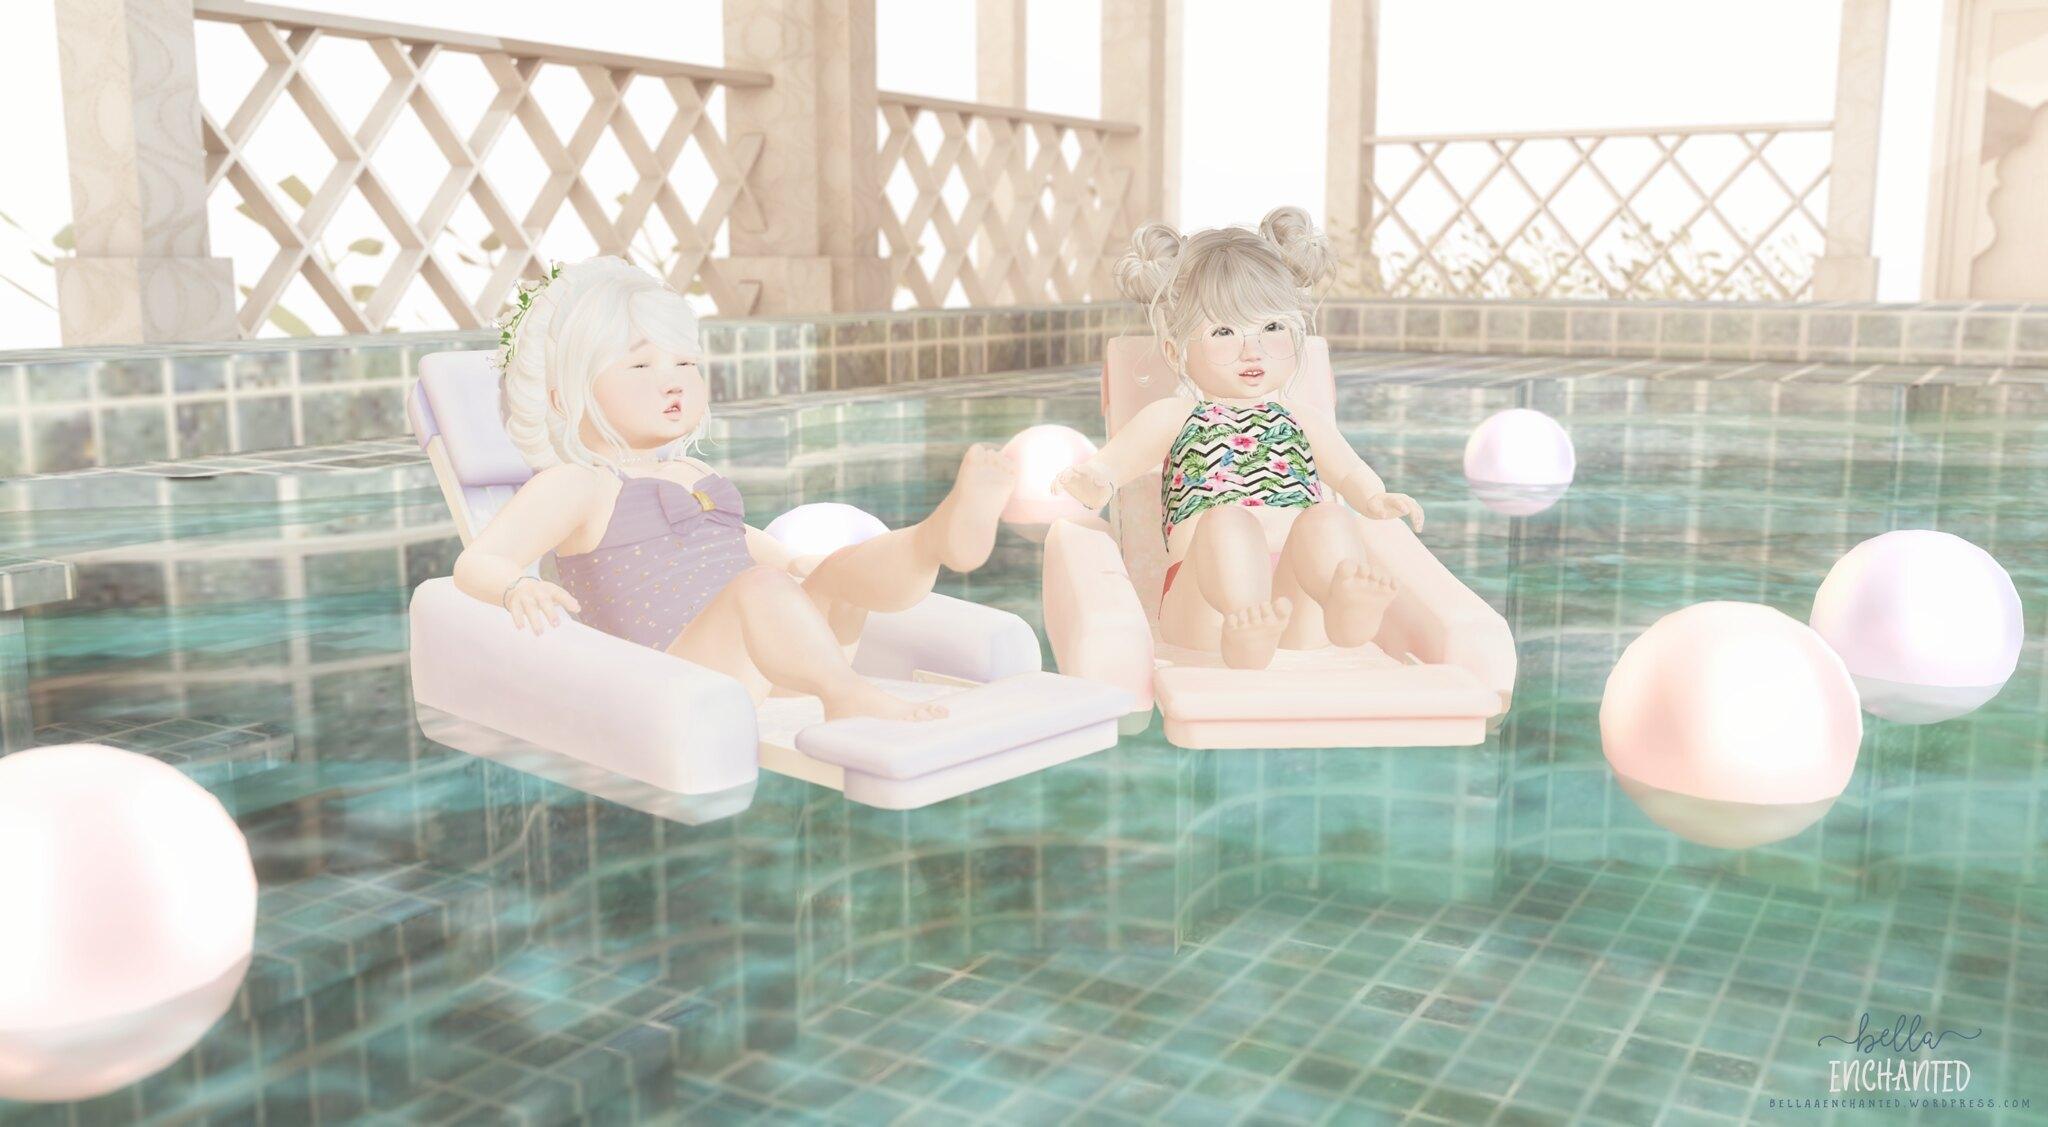 ʚ Poolside ɞ